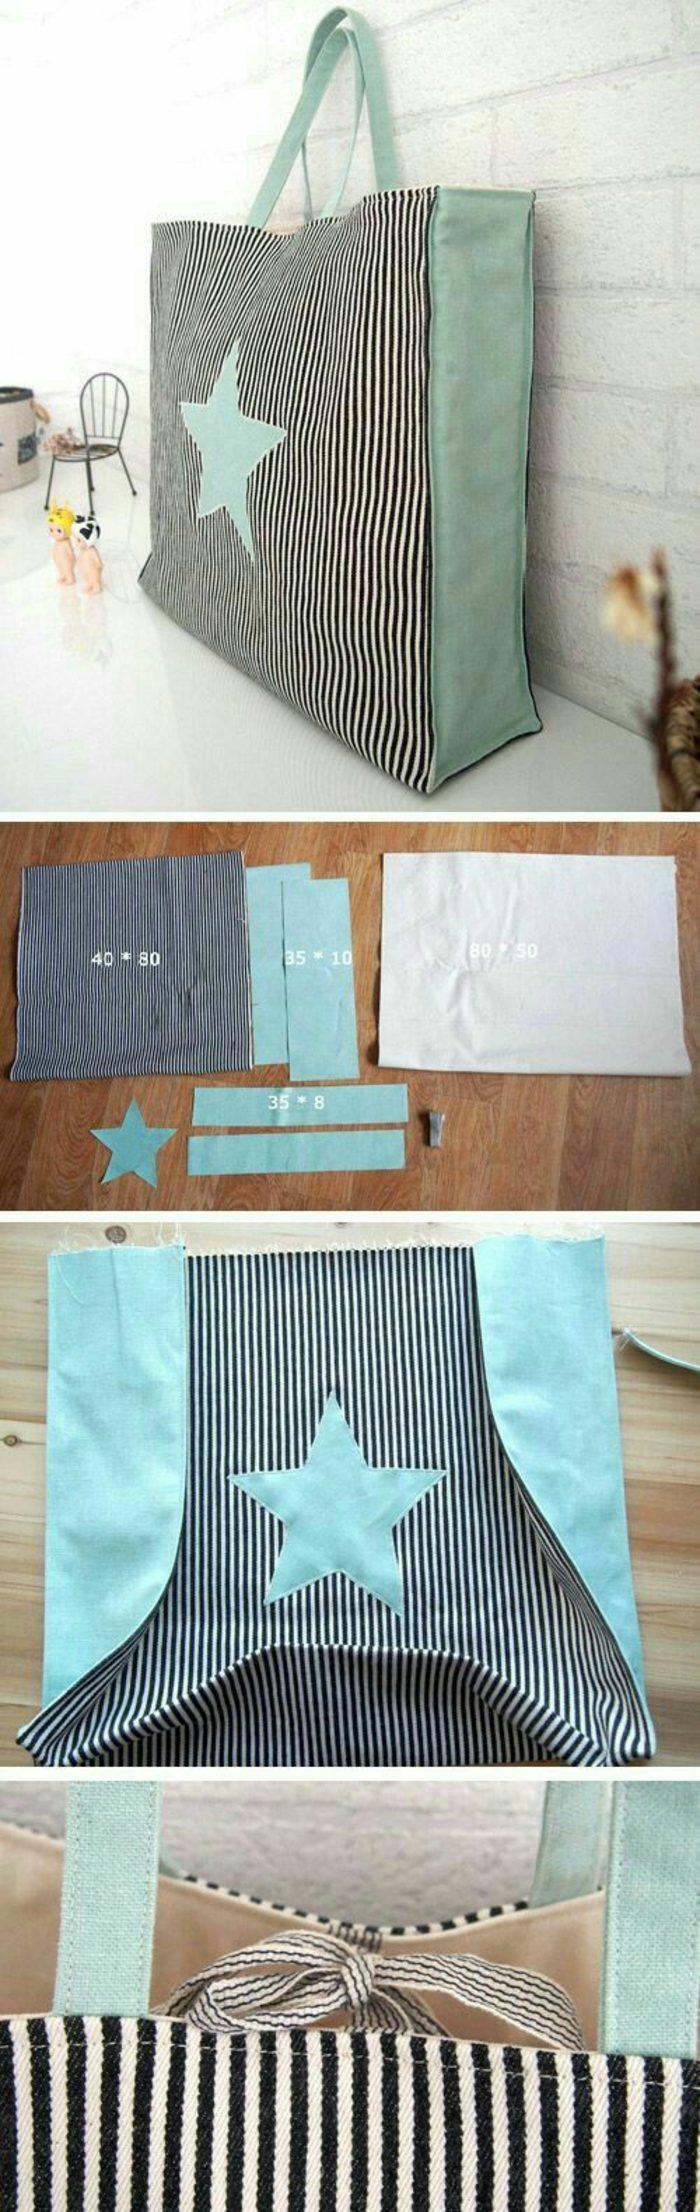 ideas-para-regalar-bolsa-cosida-a-mano-con-tutorial-de-coser-diseño-interesante